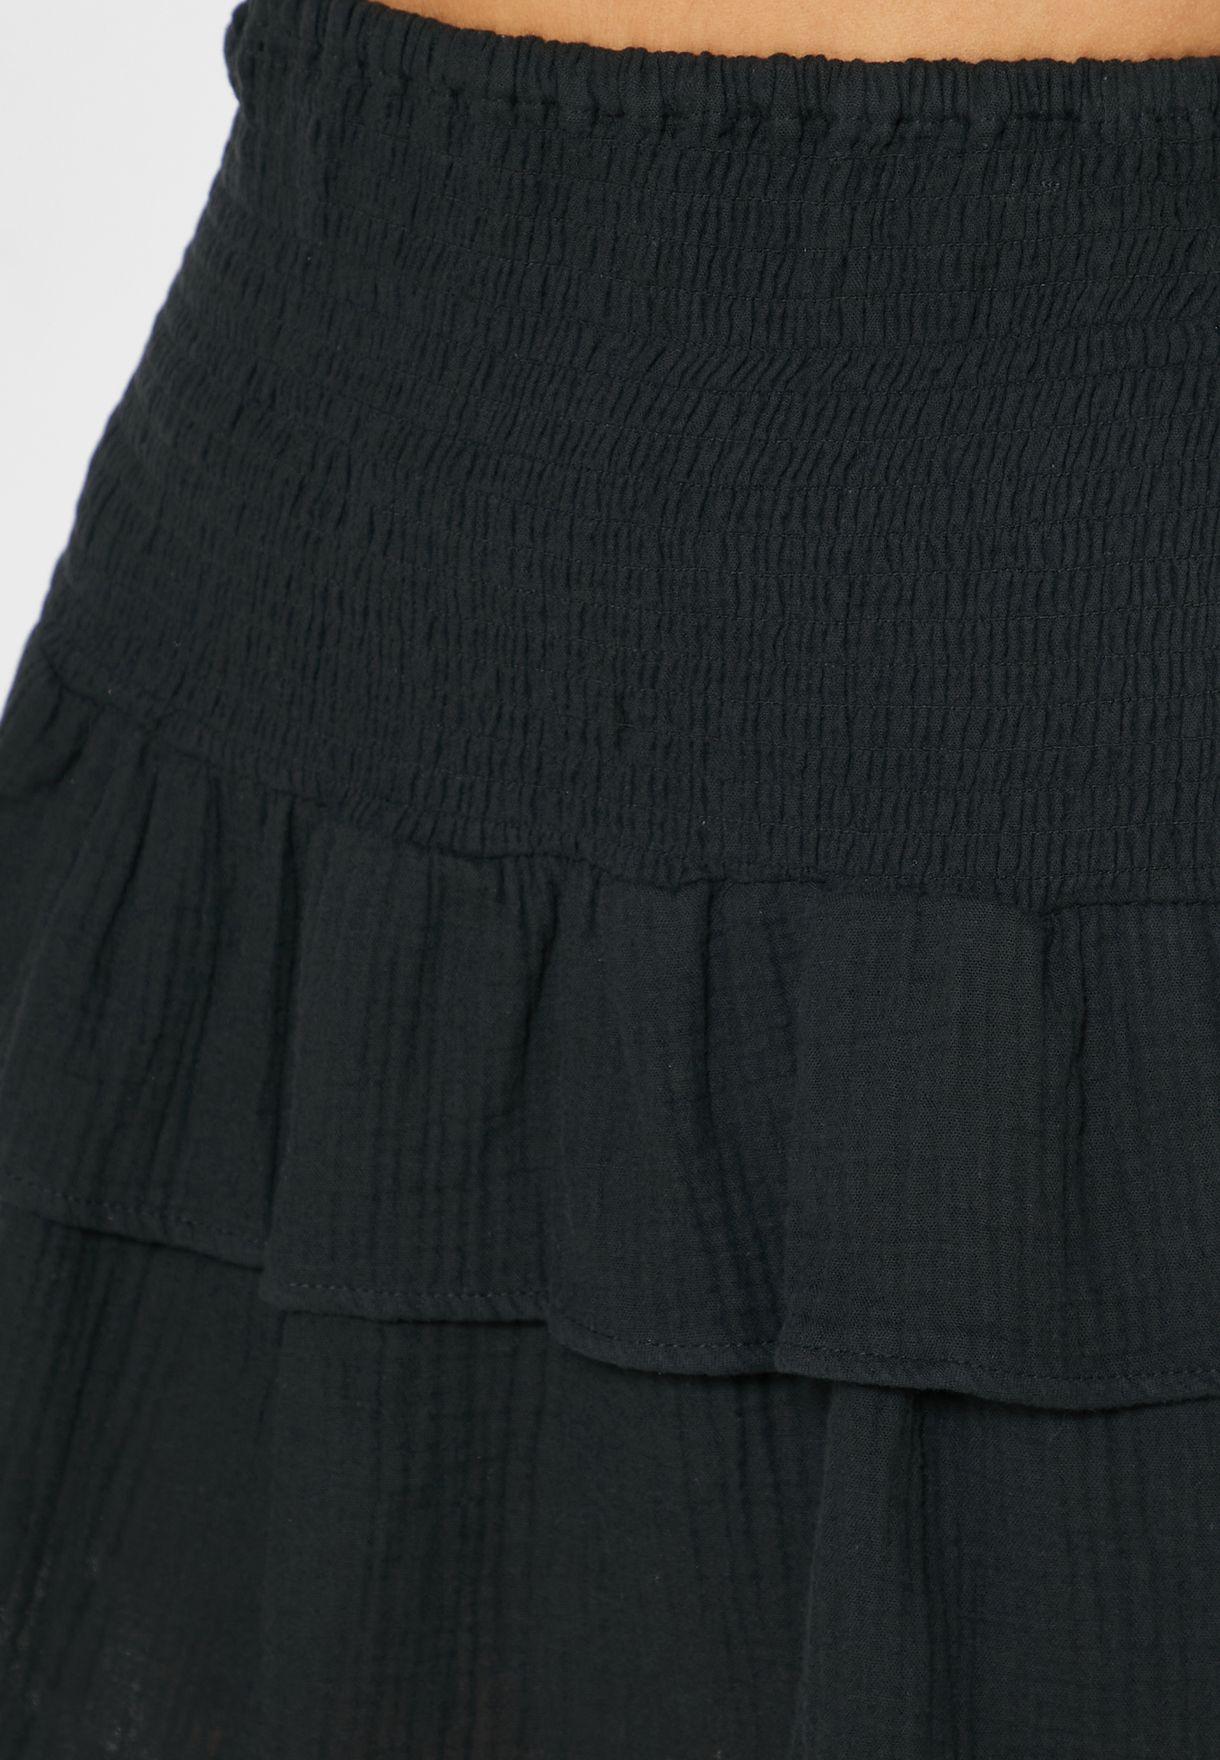 Ruffle Detail Skirt